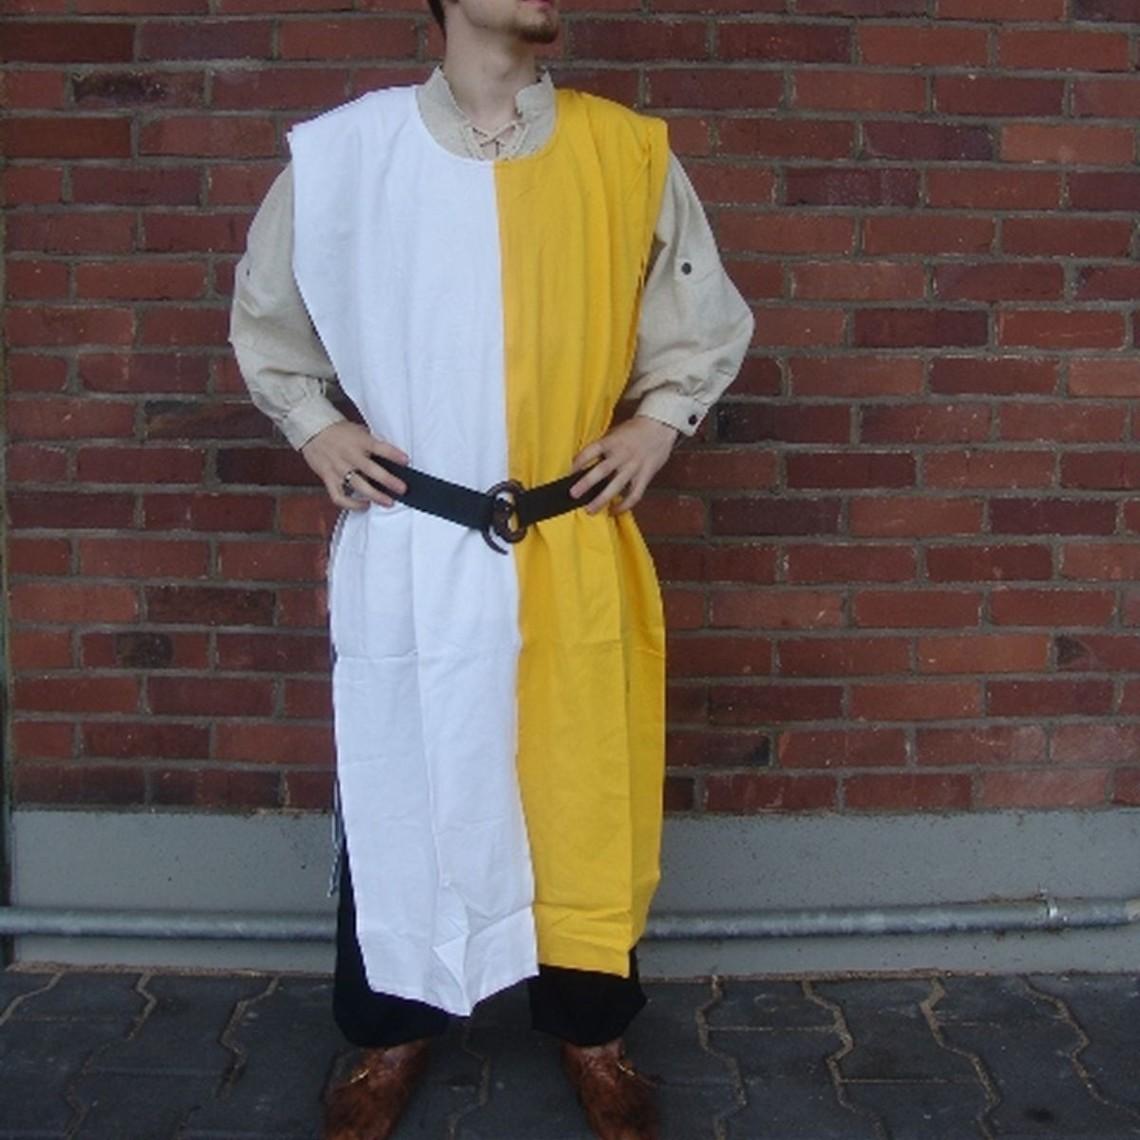 Leonardo Carbone Sobreveste hombres blanco-amarillo